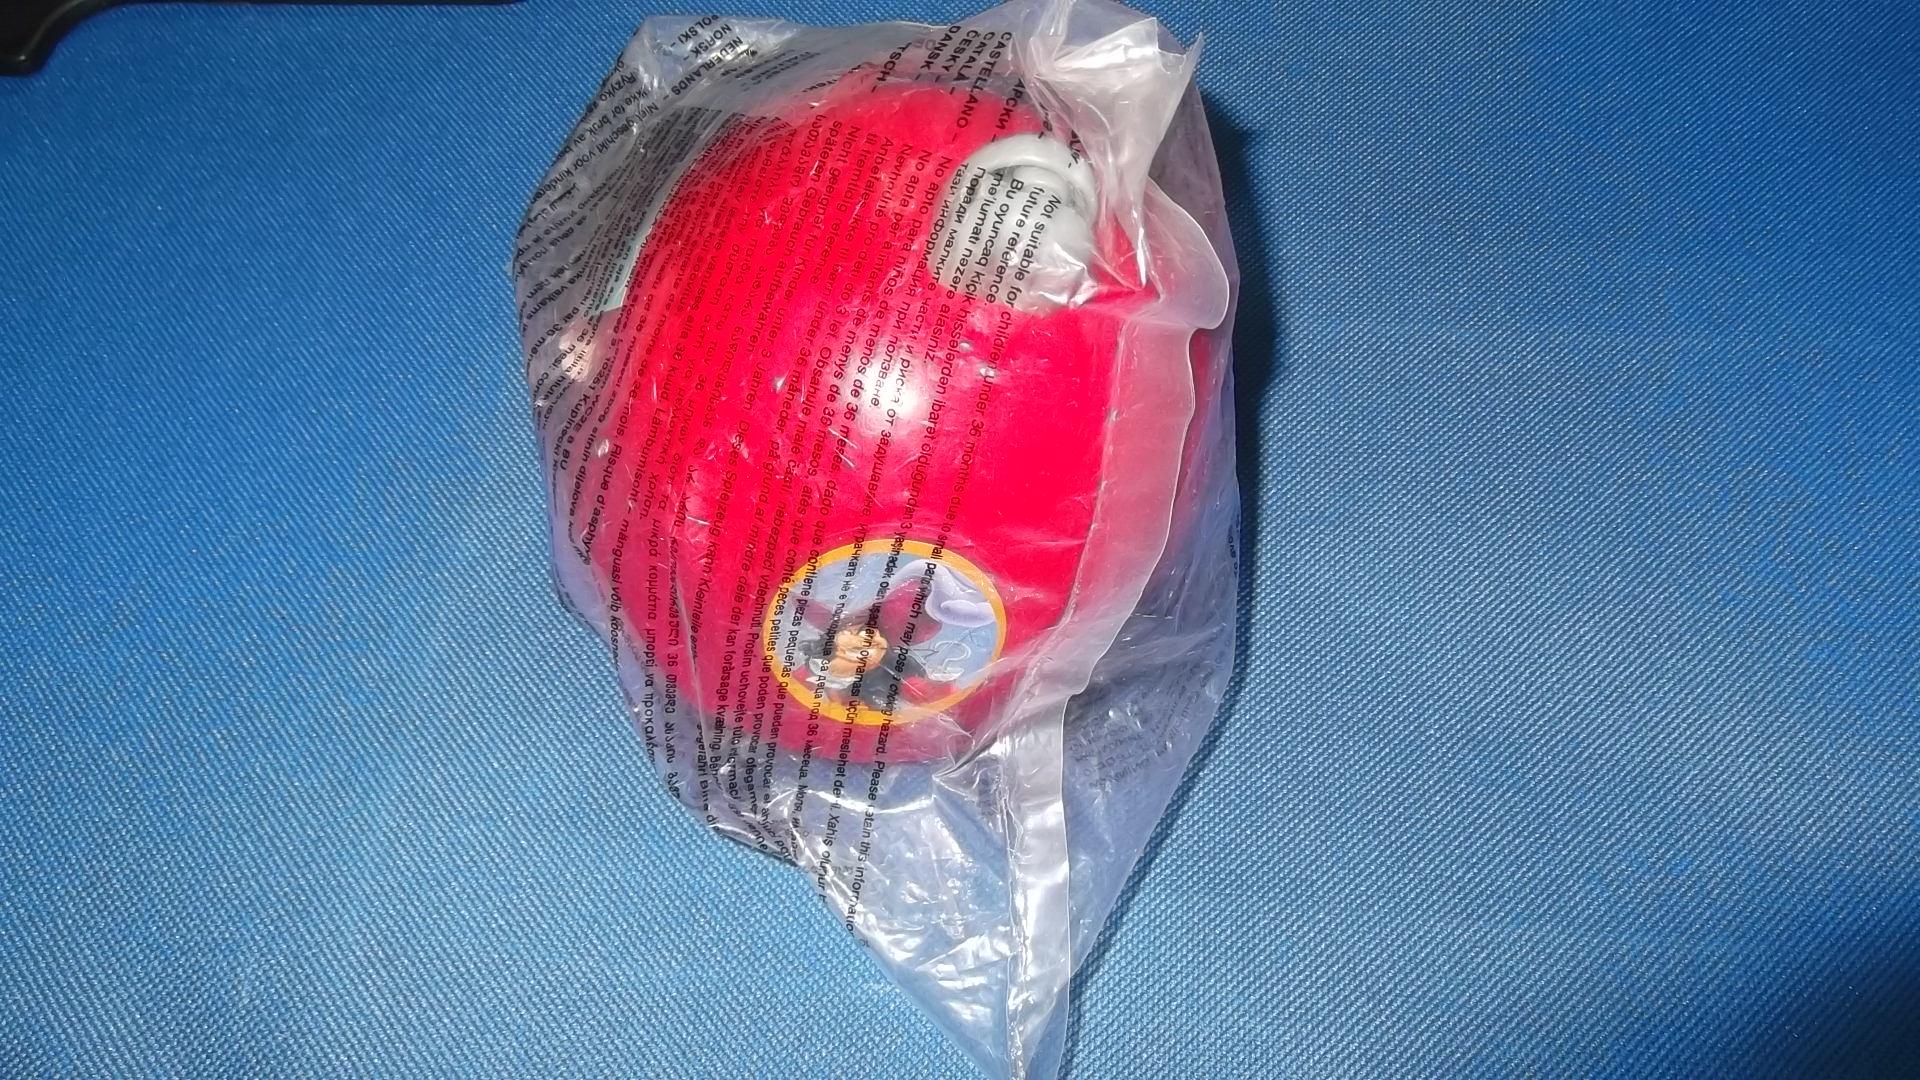 McDonalds Disney Princess & Disney Adventures Captain Hook's Hook Toy From 2004 New